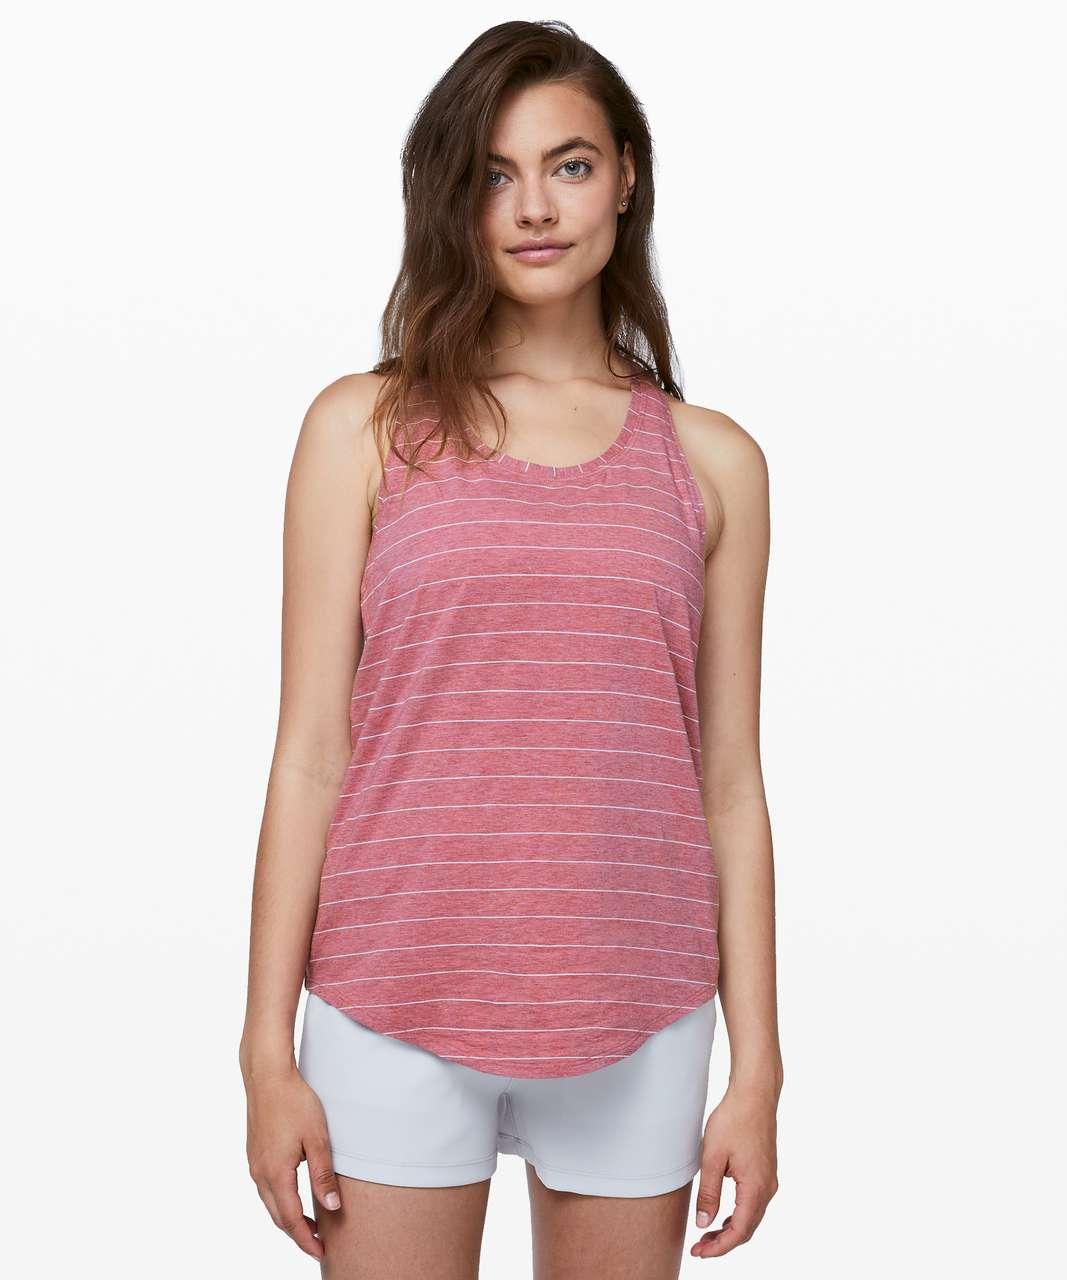 Lululemon Love Tank *Pleated - Short Serve Stripe Heathered So Merlot White